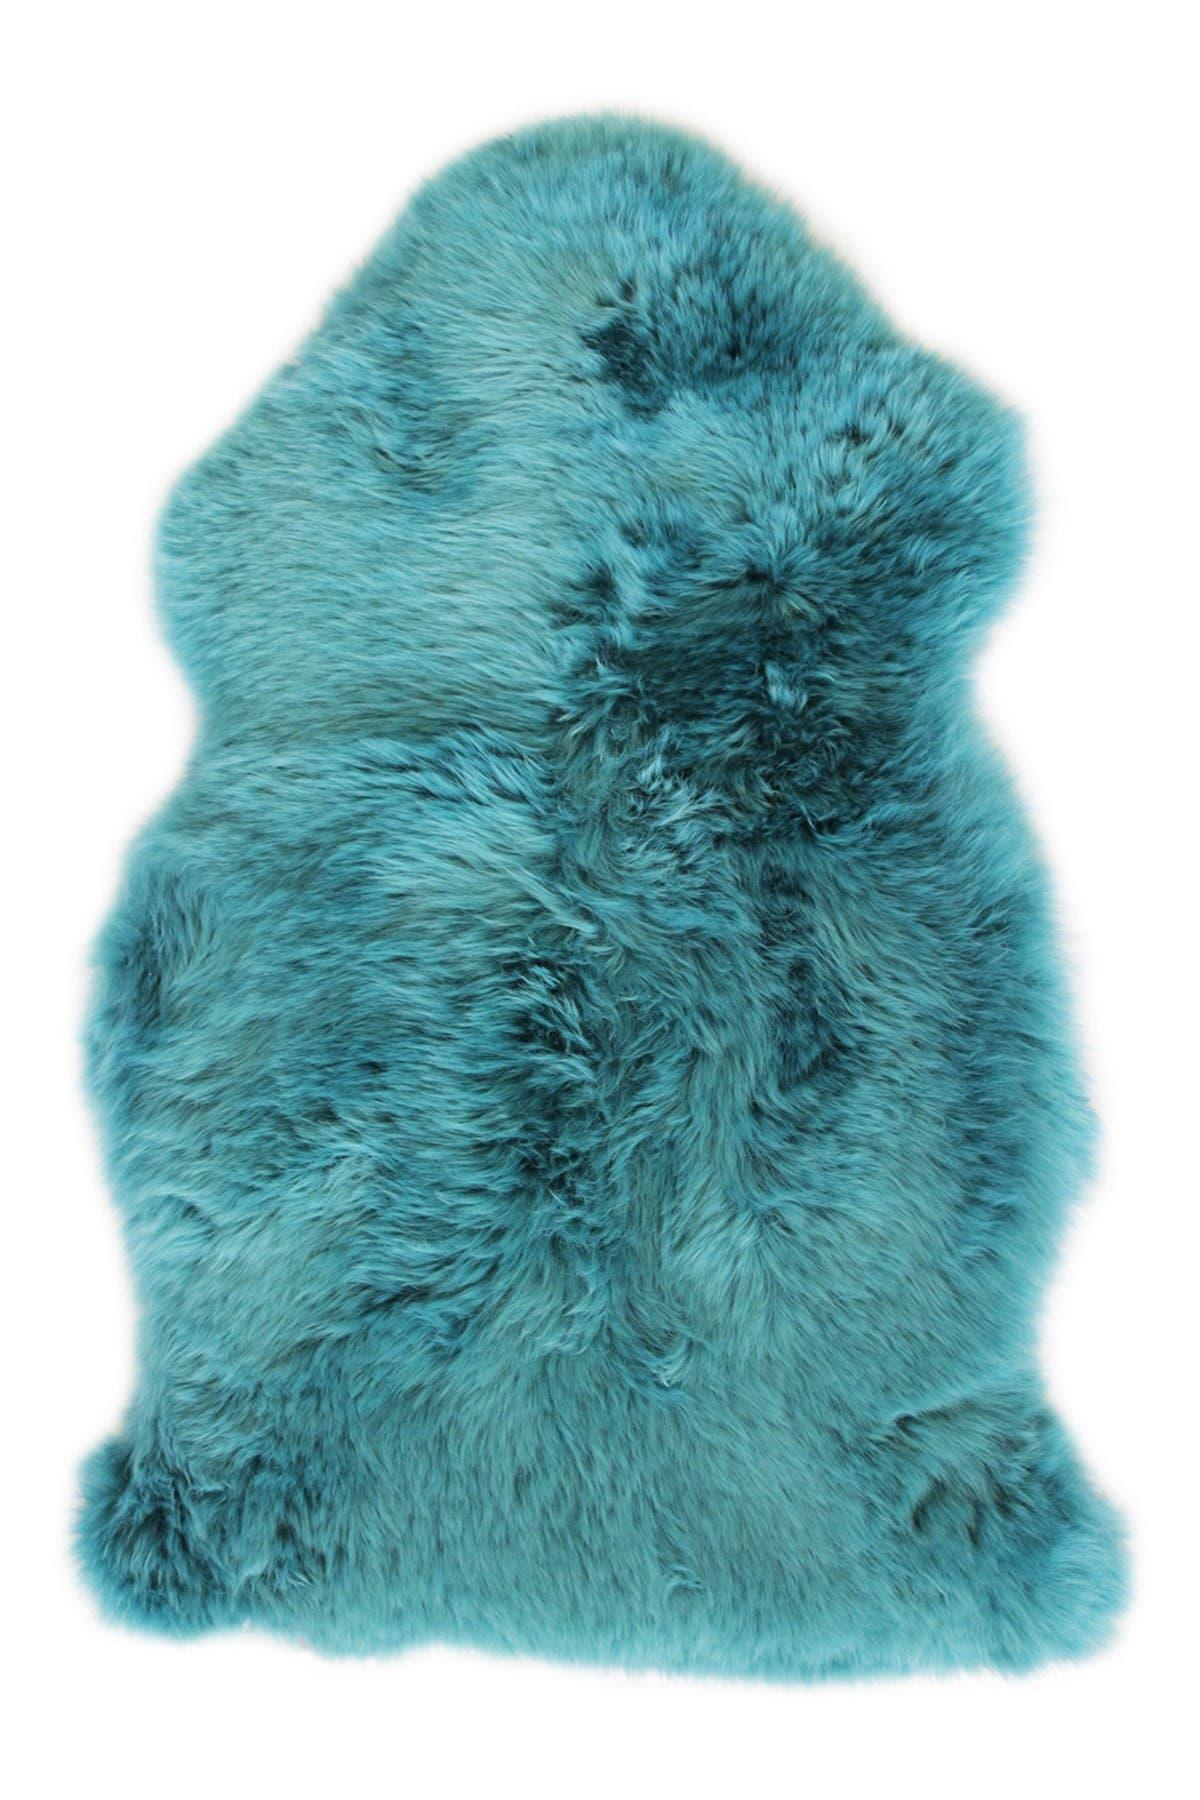 Image of Natural Milan Genuine Sheep Shearling Single Sheepskin Rug - 2ft x 3ft - Steel Blue